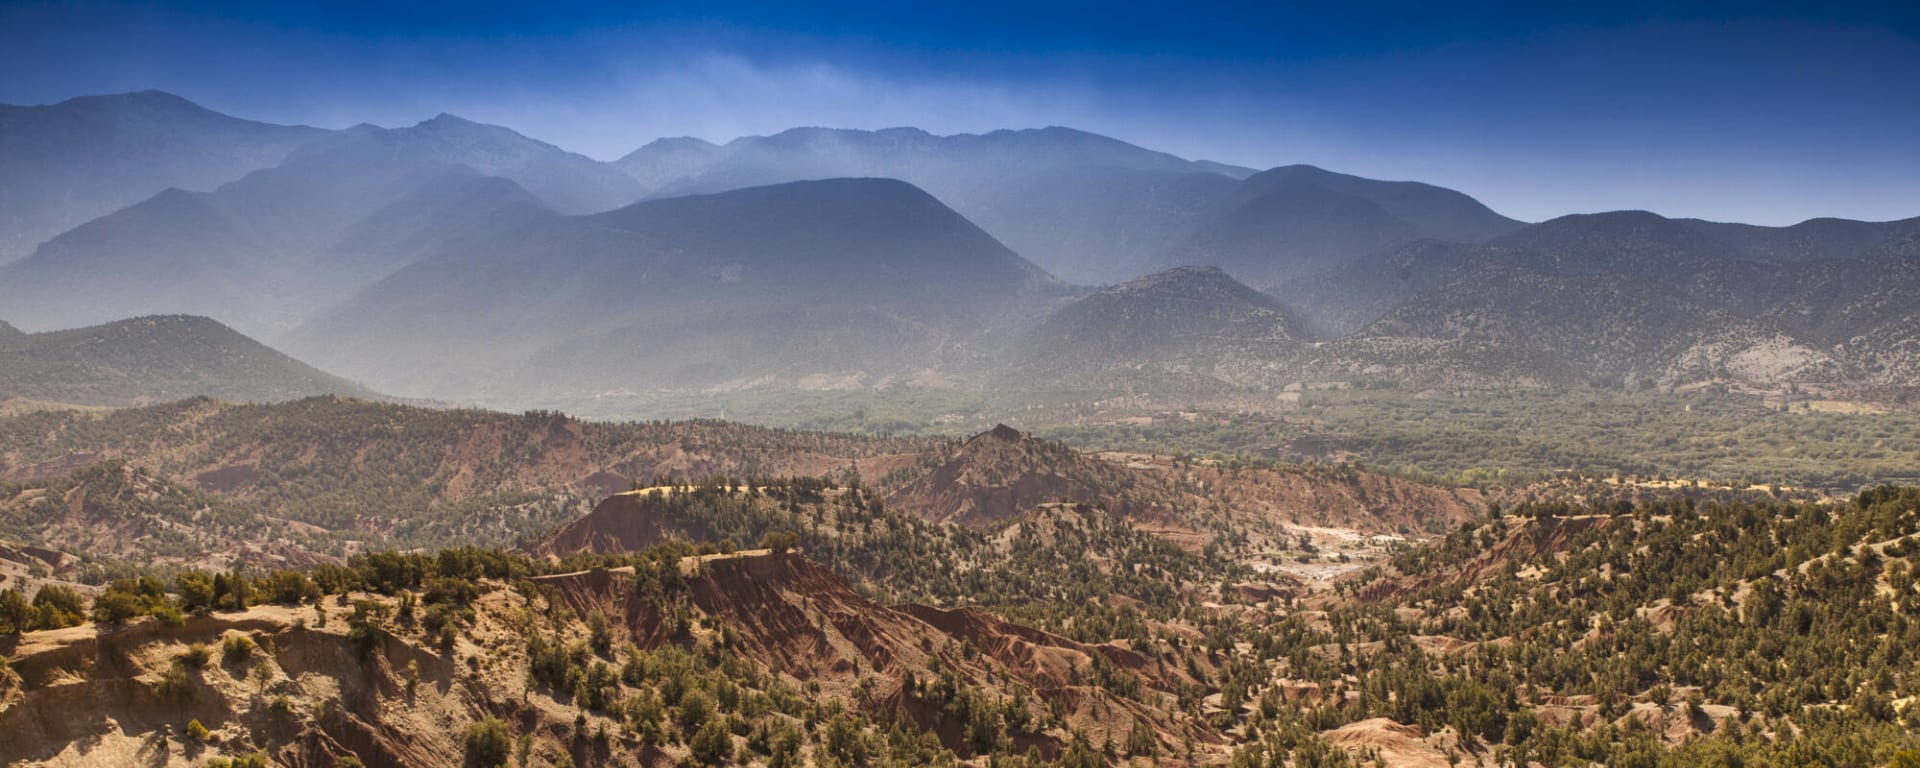 Südmarokko - Atlas & Wüste ab Marrakesch: Marokko Atlas Gebirge Landschaft